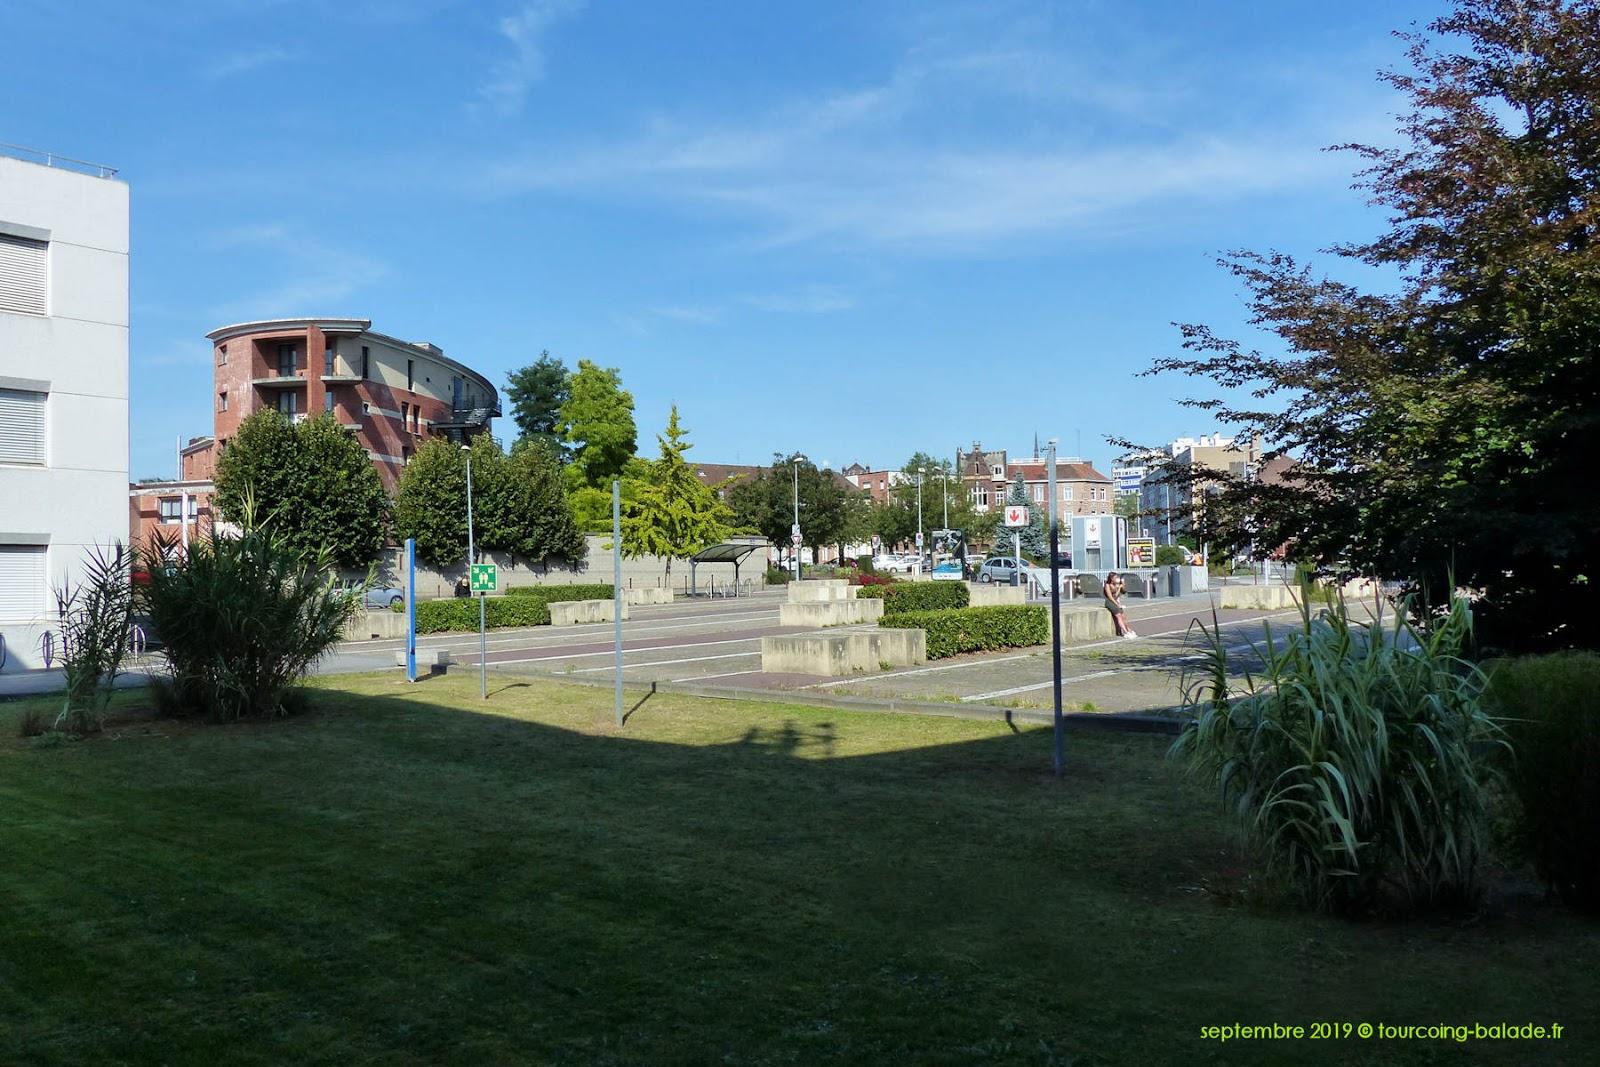 Place Sébastopol, Tourcoing 2020